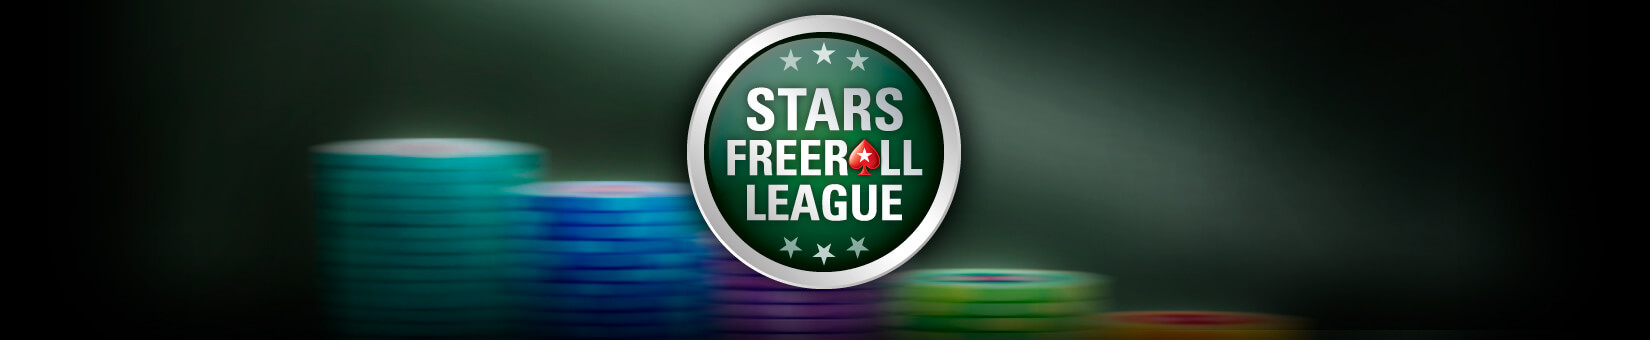 Casino Daily Freeroll Pokerstars Ticket